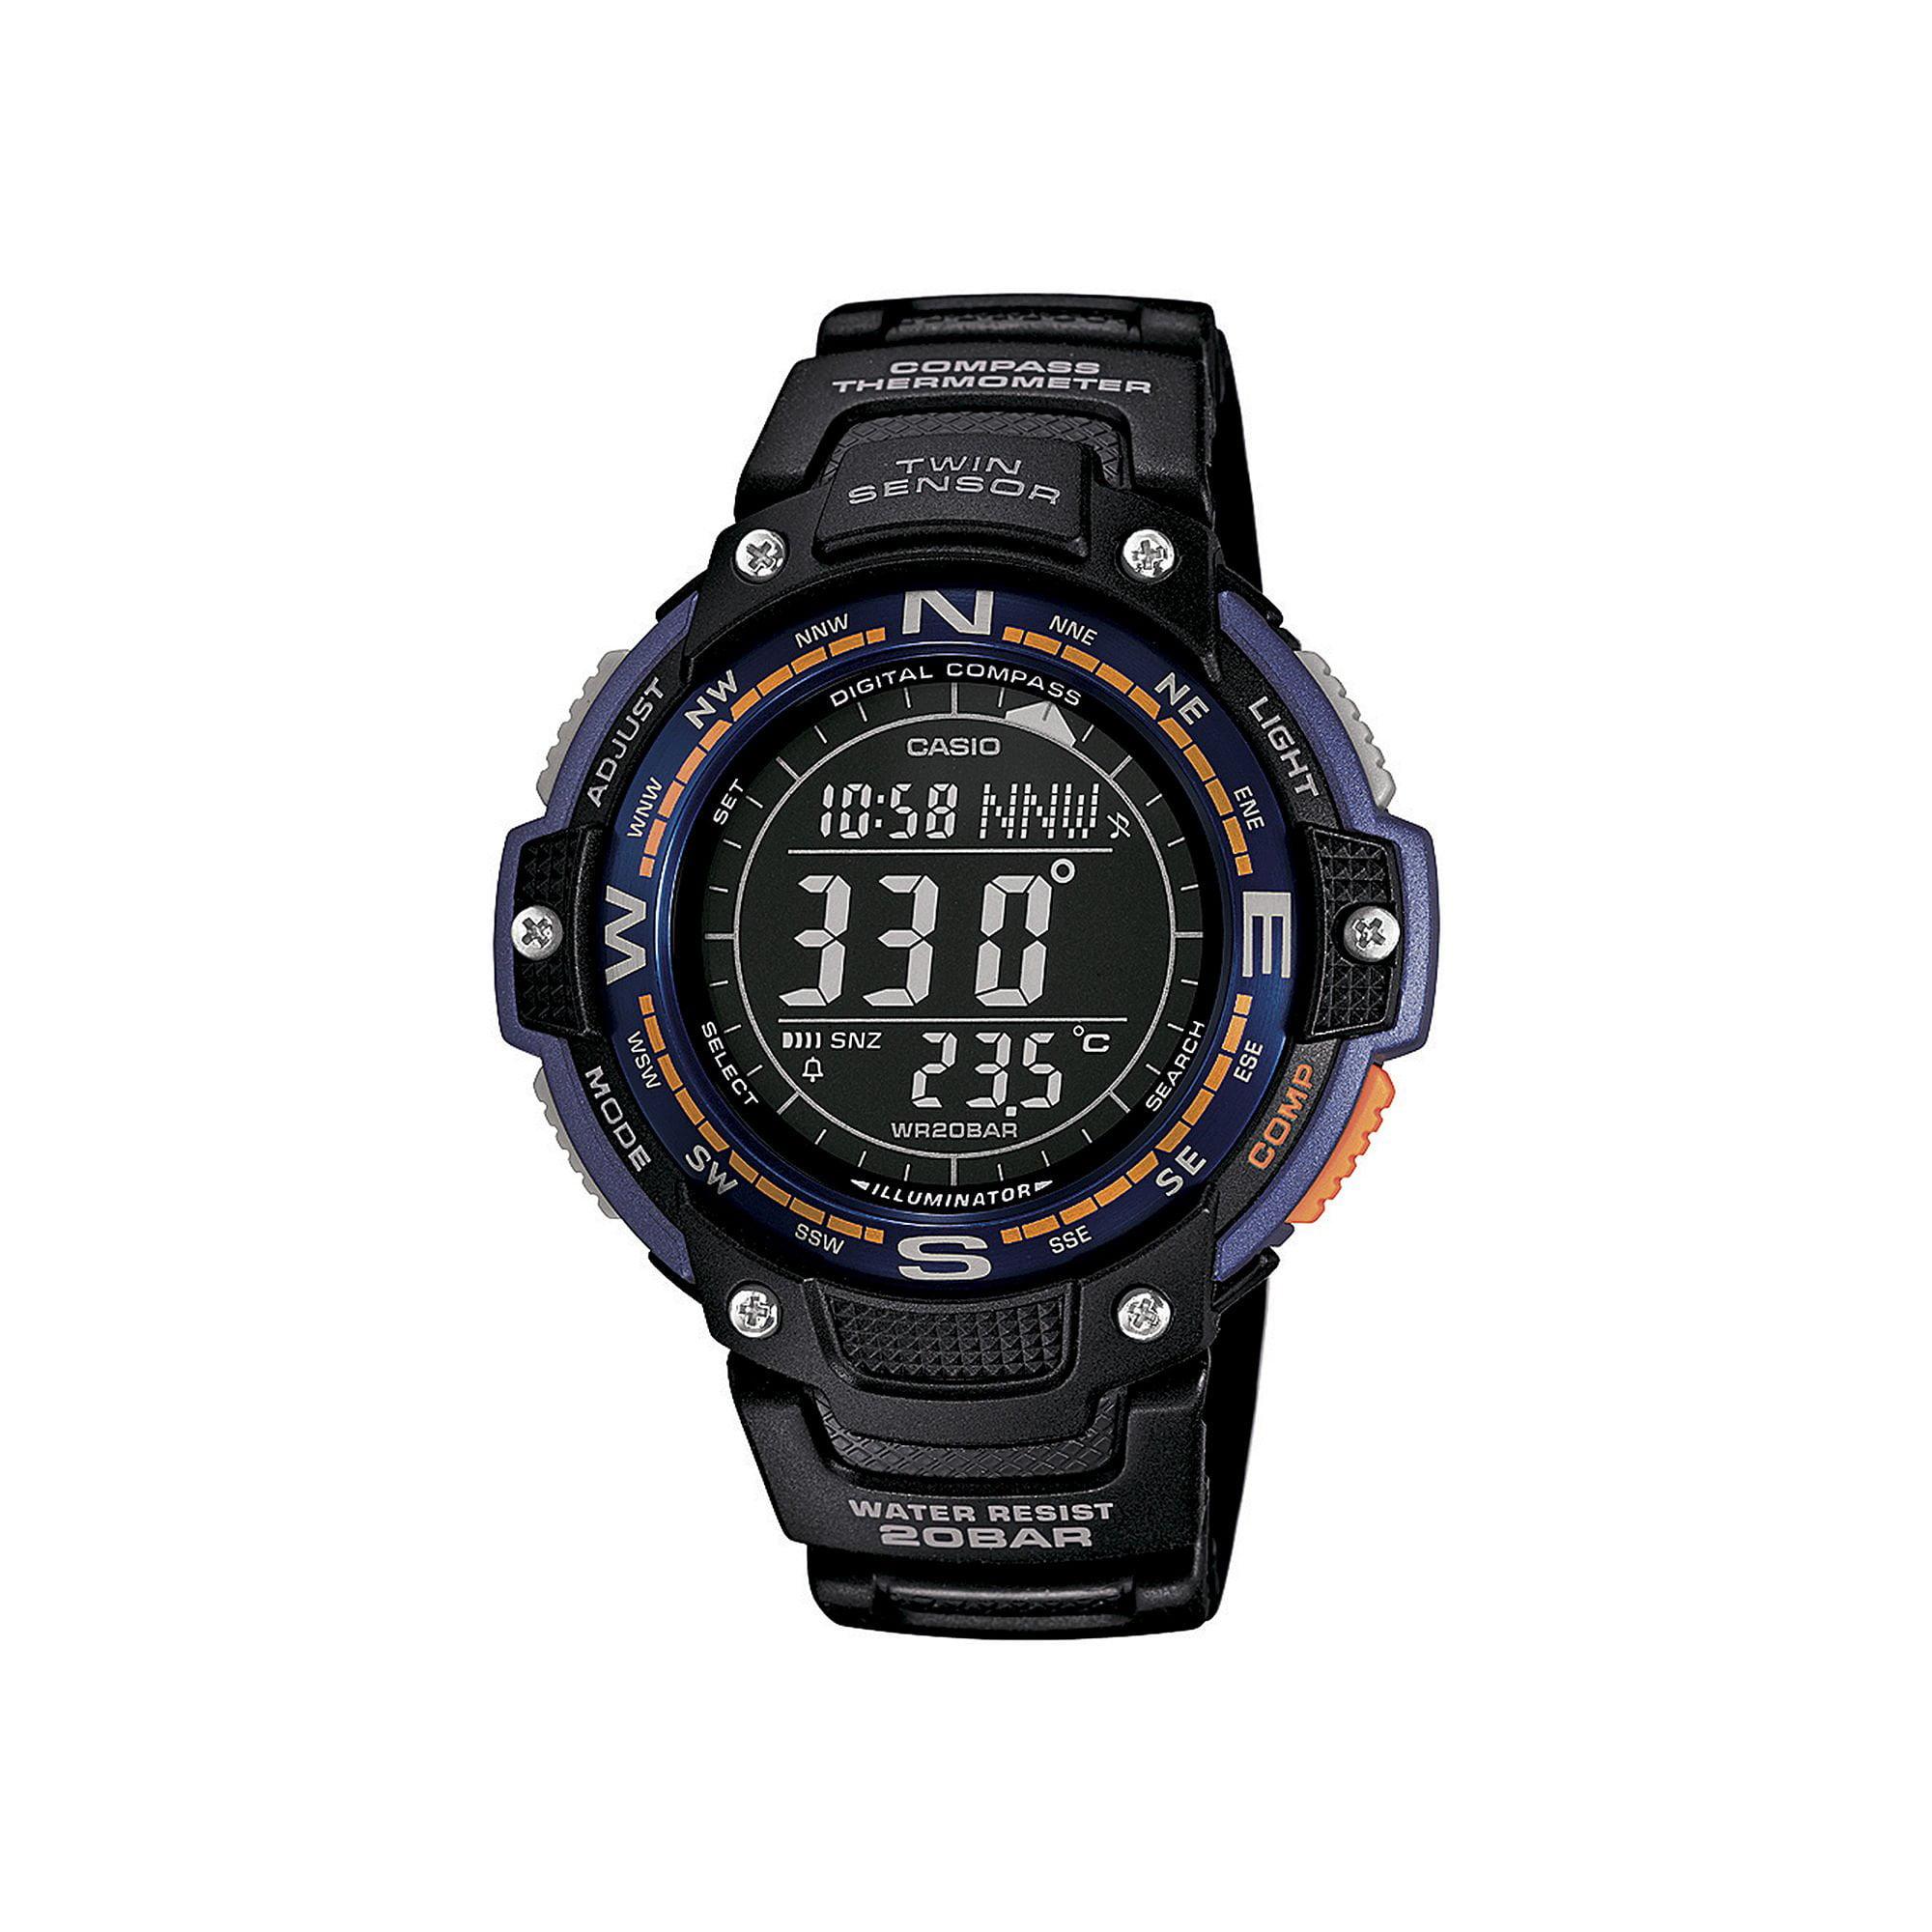 Reloj Inteligente Casio Sgw100-2b - muñeca - altímetro, barómetro, brújula Digital, termómetro - reloj Smart Watch alarma, calendario, cronómetro - 26297.40 horas - Black - cristal, resina - deportes - resistente al agua (sgw100-2b) + Casio en VeoyCompro.